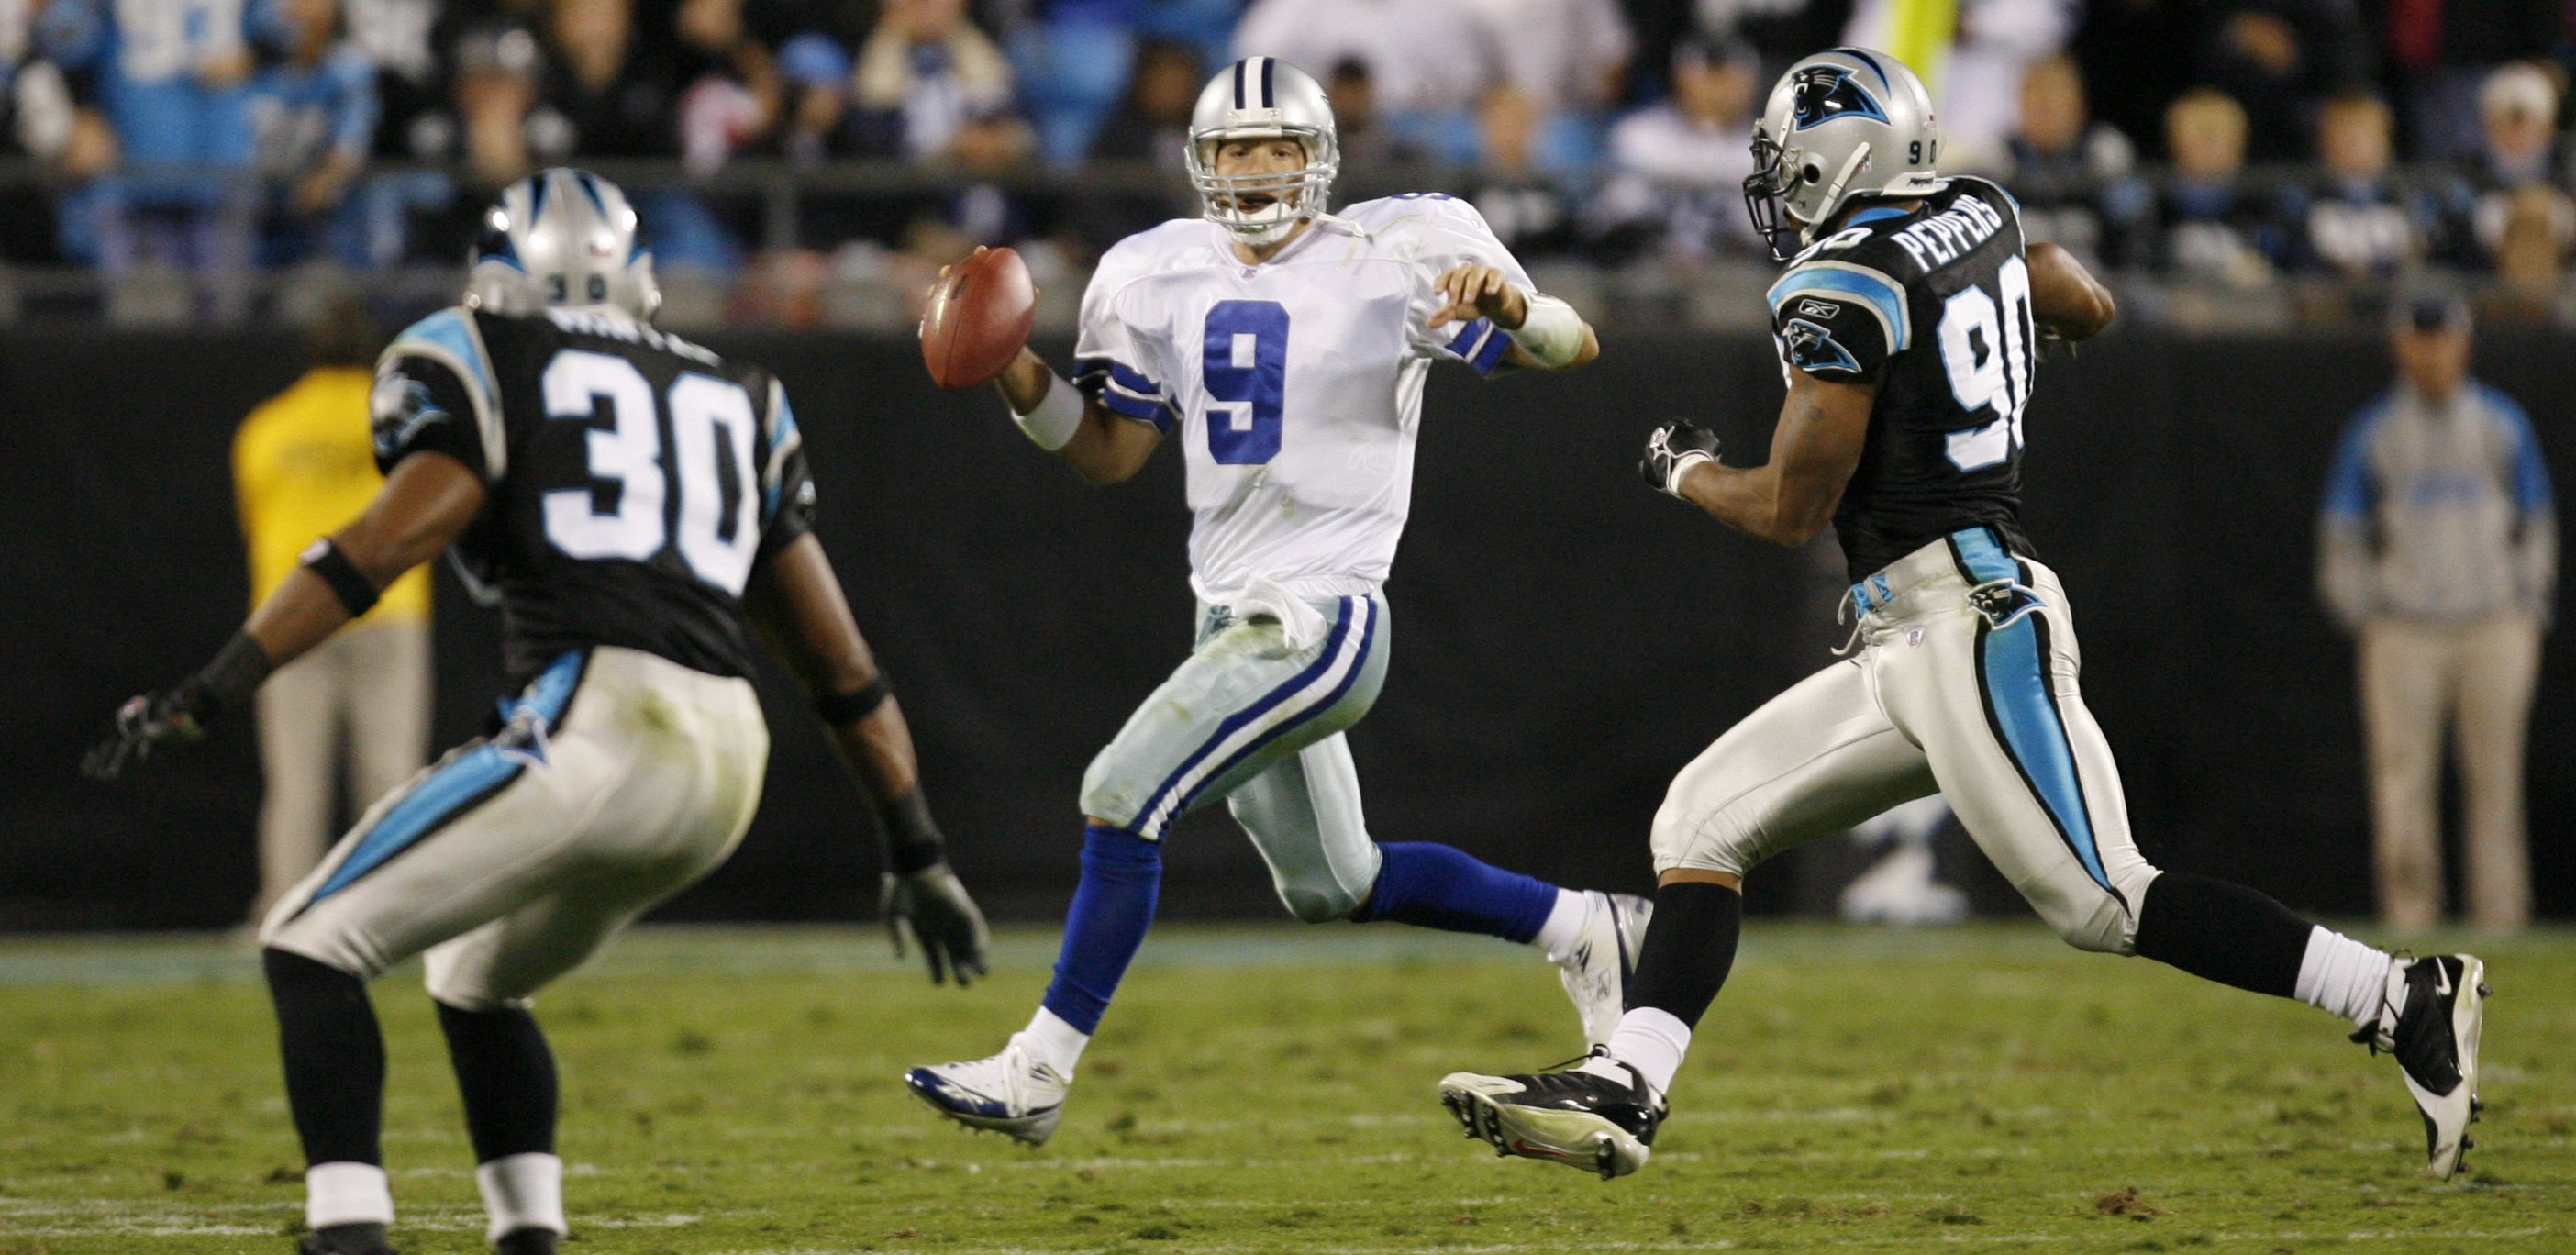 Cowboys Blog - Dallas Cowboys Vs Carolina Panthers: TV, Live Stream, Tickets